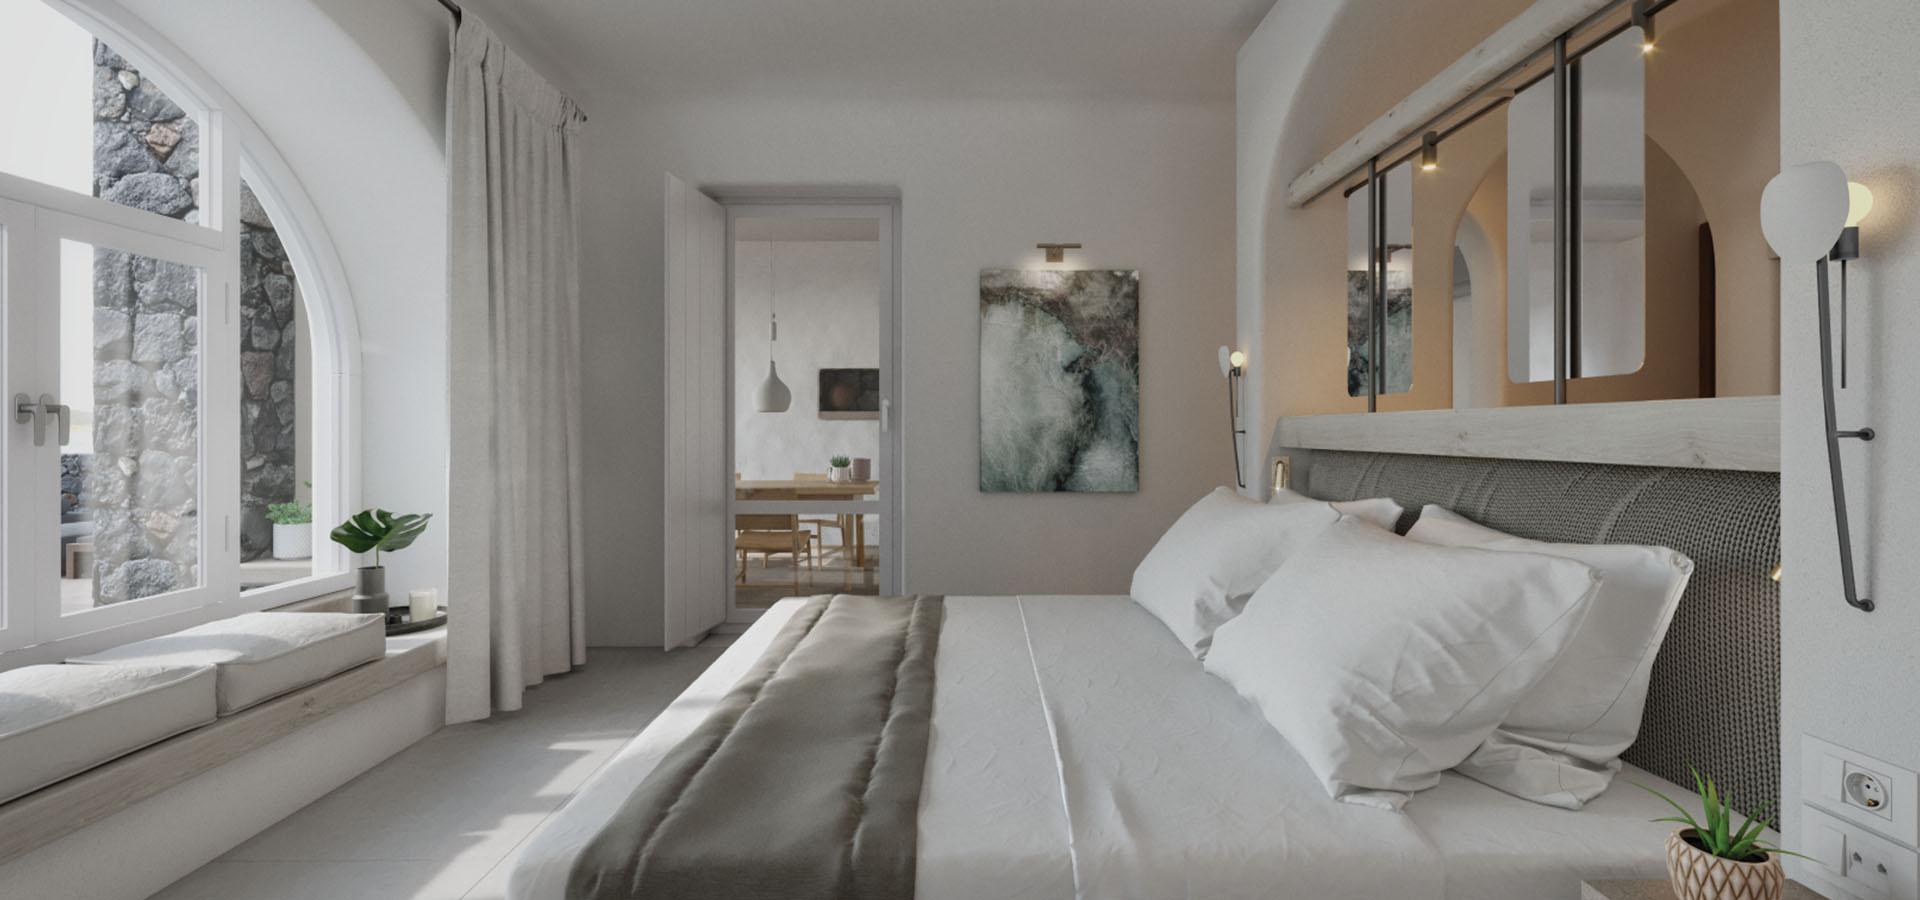 Epitome Canaves Oia Santorini Luxury Hotel 2